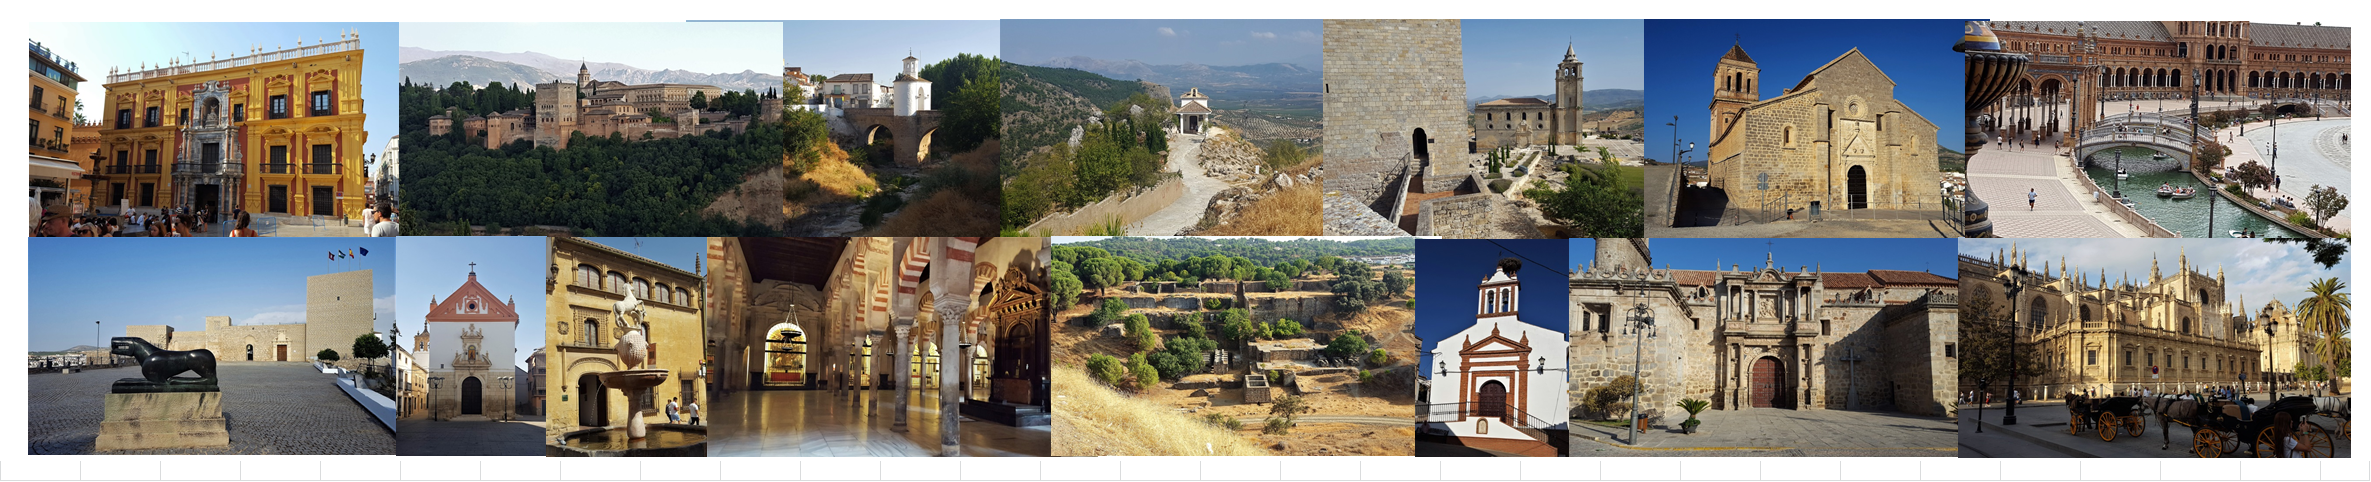 Malaga, Granada, Pinos Puente, Moclin, Alcala la Real, Alcaudete, Baena, Castro del Rio, Cordoba, Cerro Muriano, Hinojosa del Duque, Sevilla